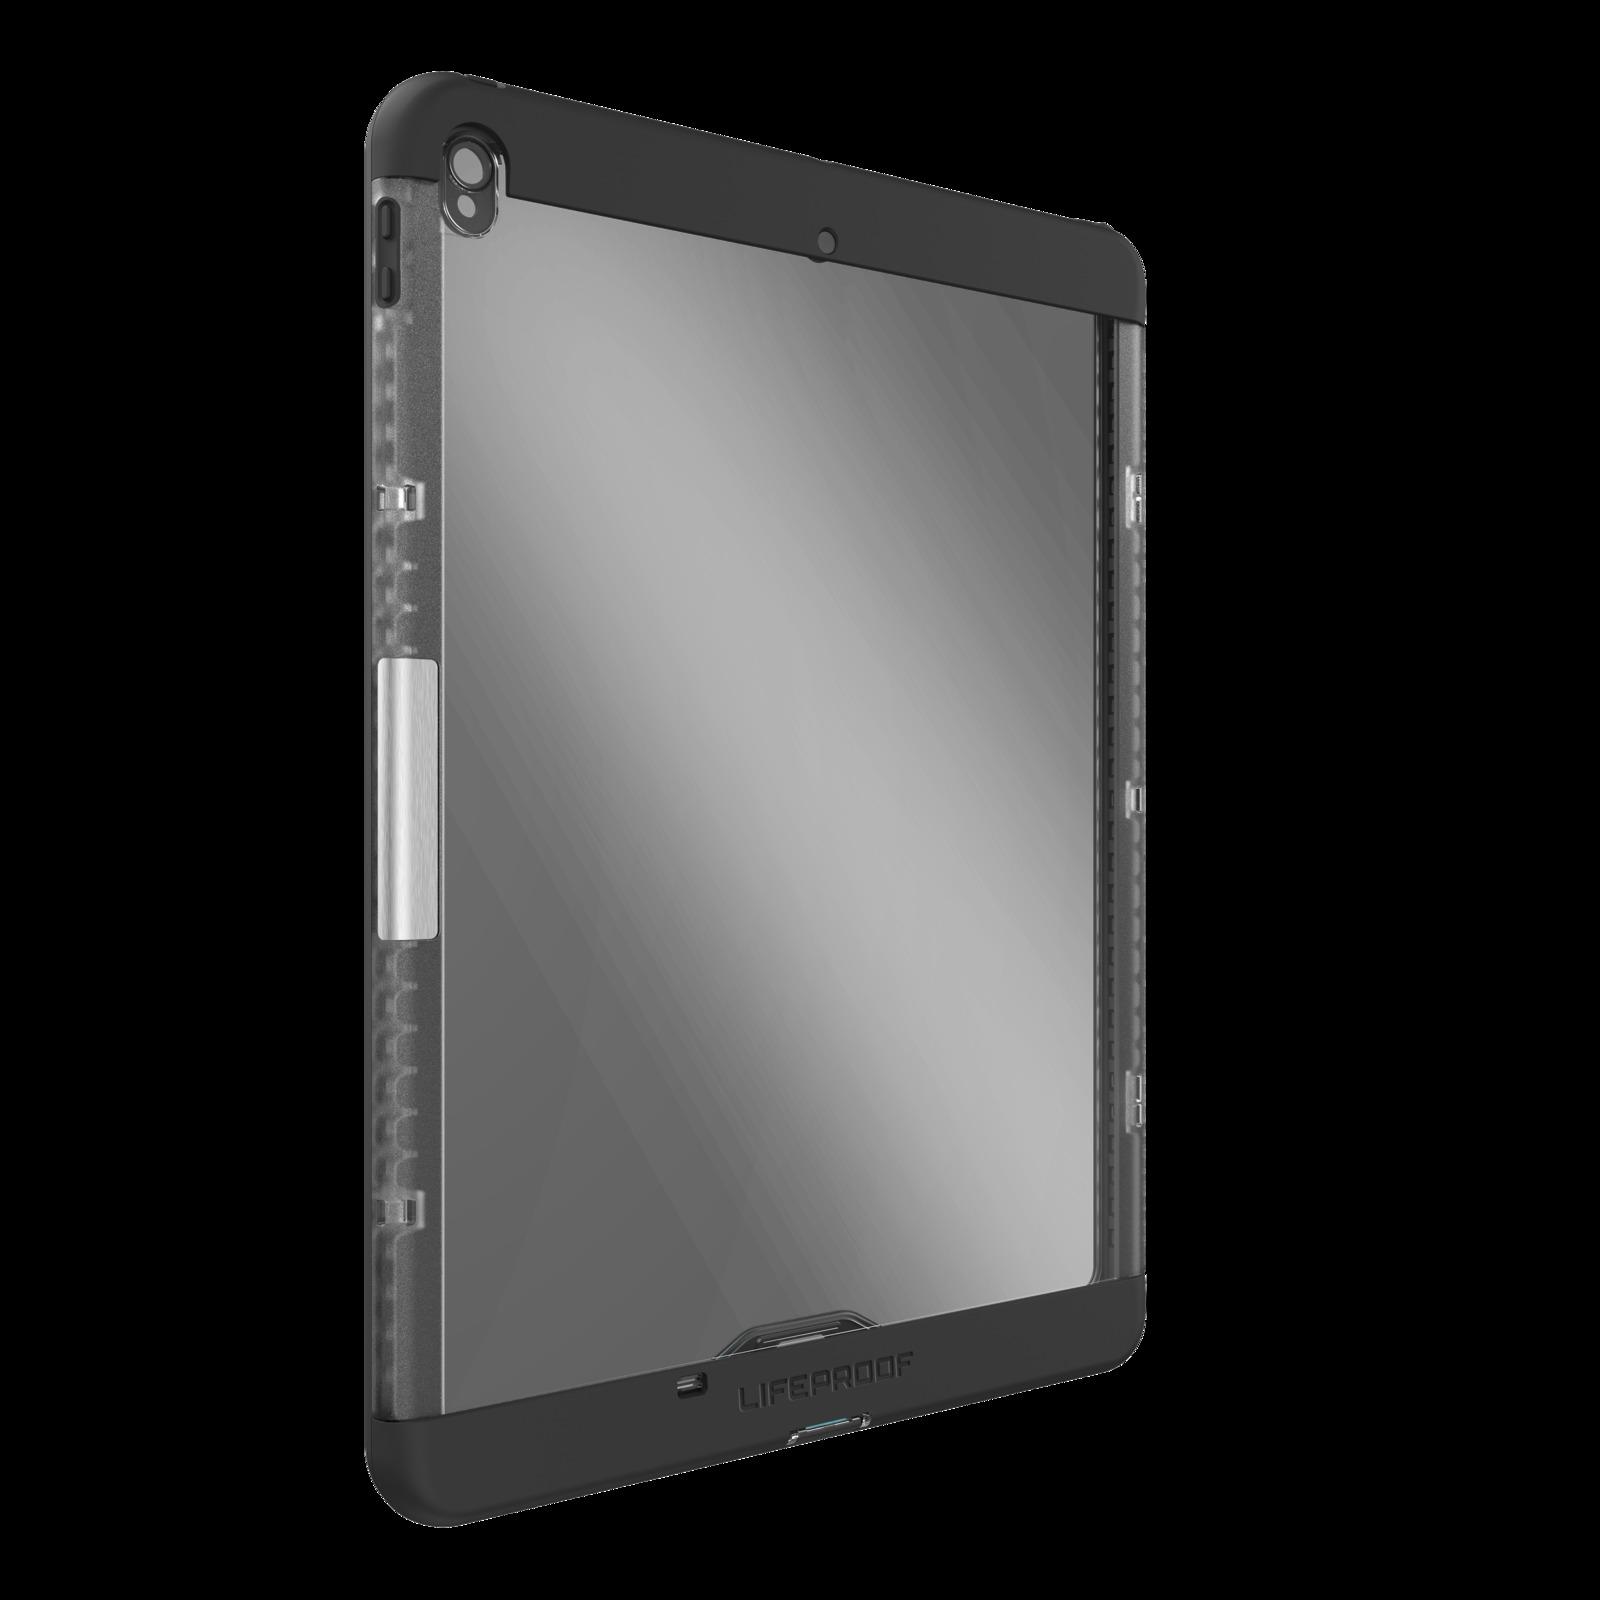 wholesale dealer b82b5 0bfab Lifeproof Nuud - iPad Pro 12.9 (2nd Gen) - Black